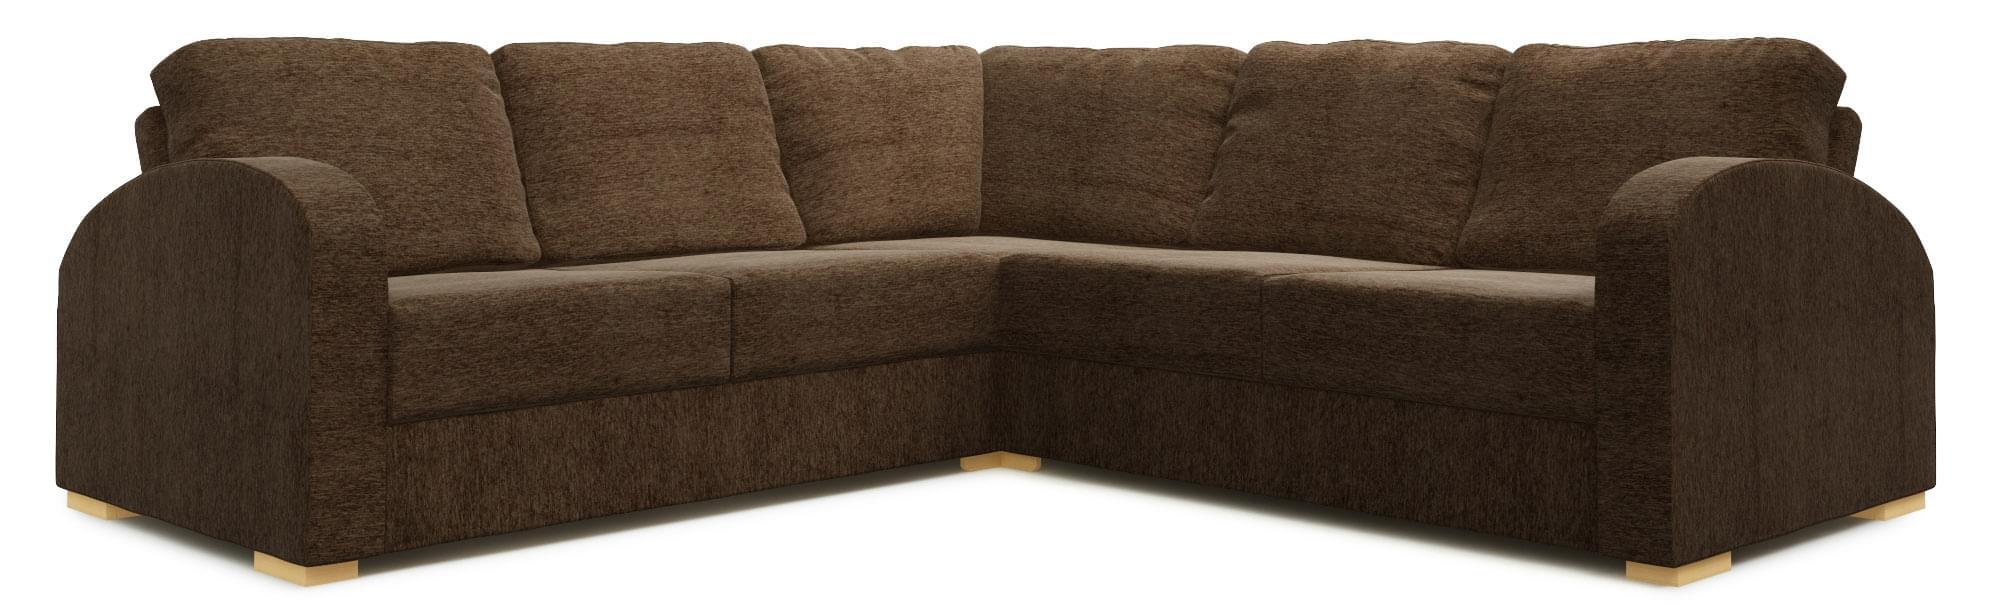 Holl 3X3 Corner Sofa